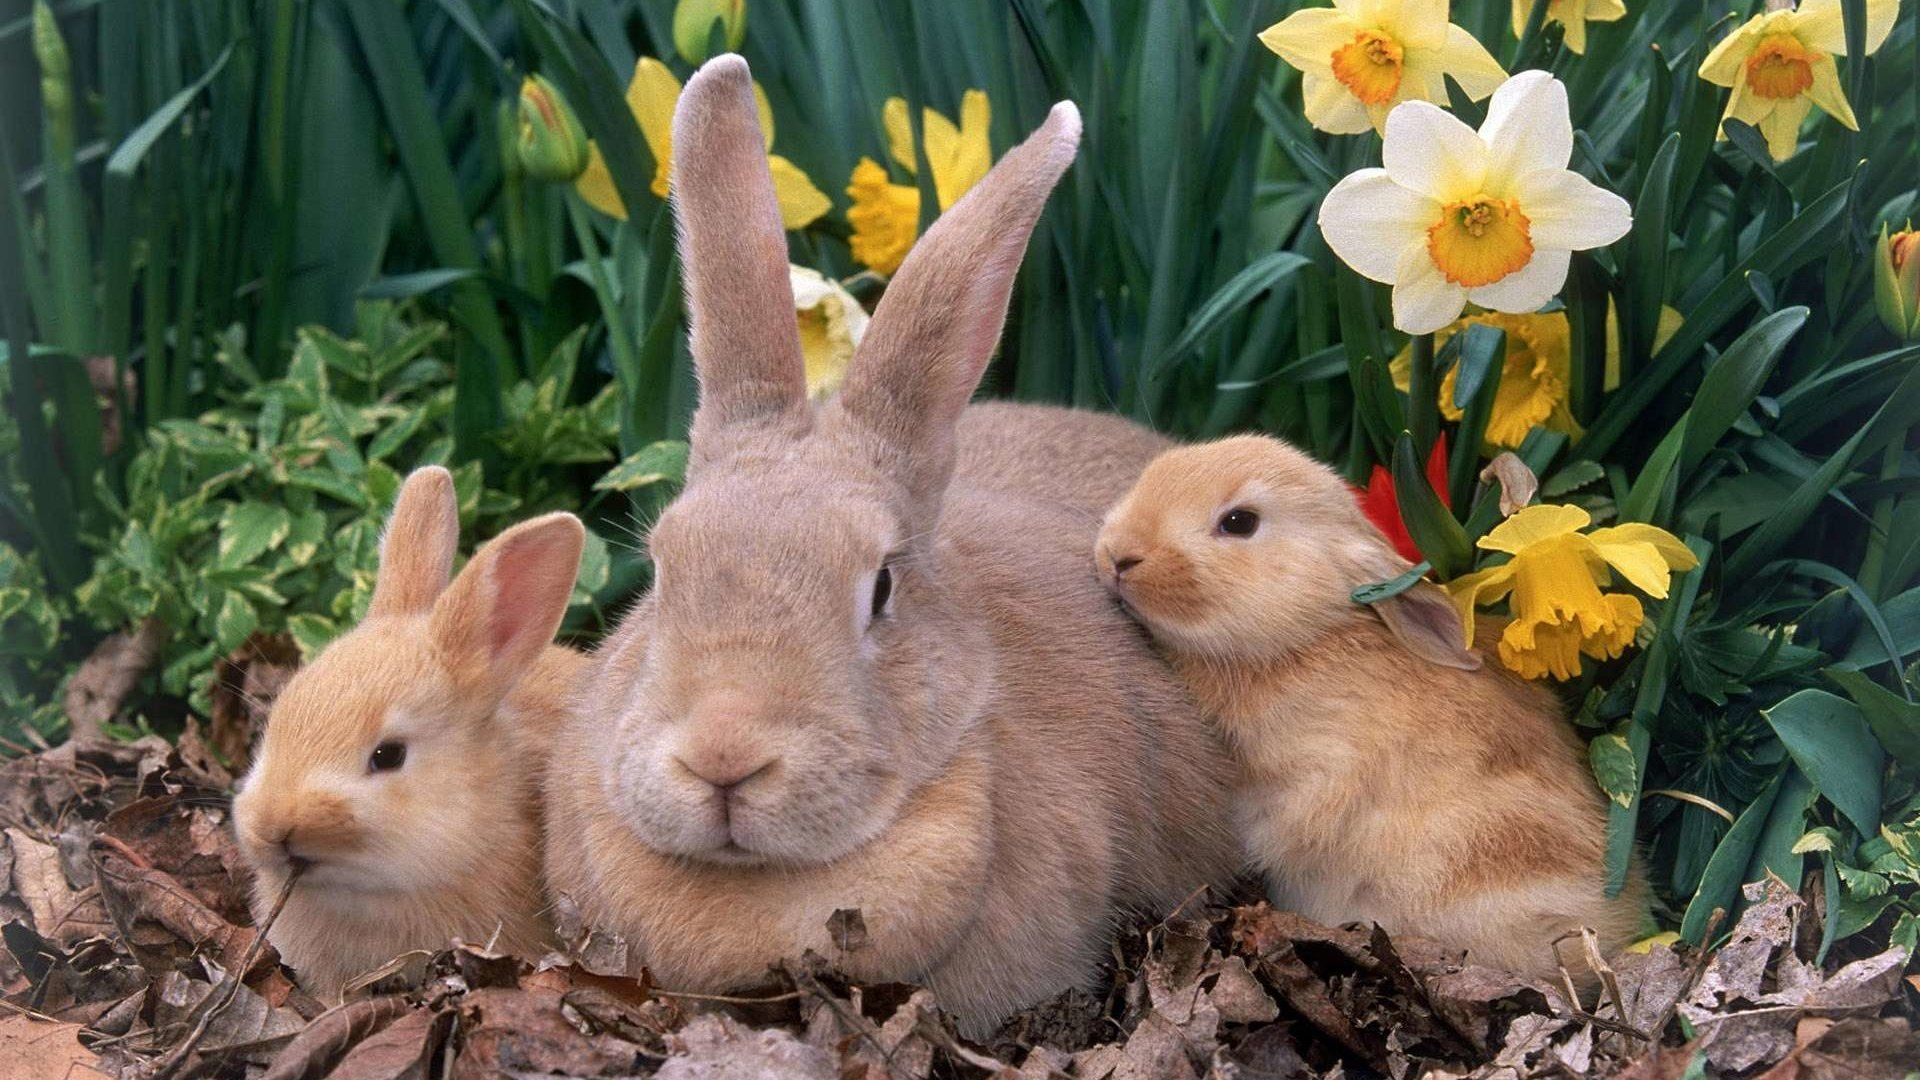 Bunny Nice Wallpaper